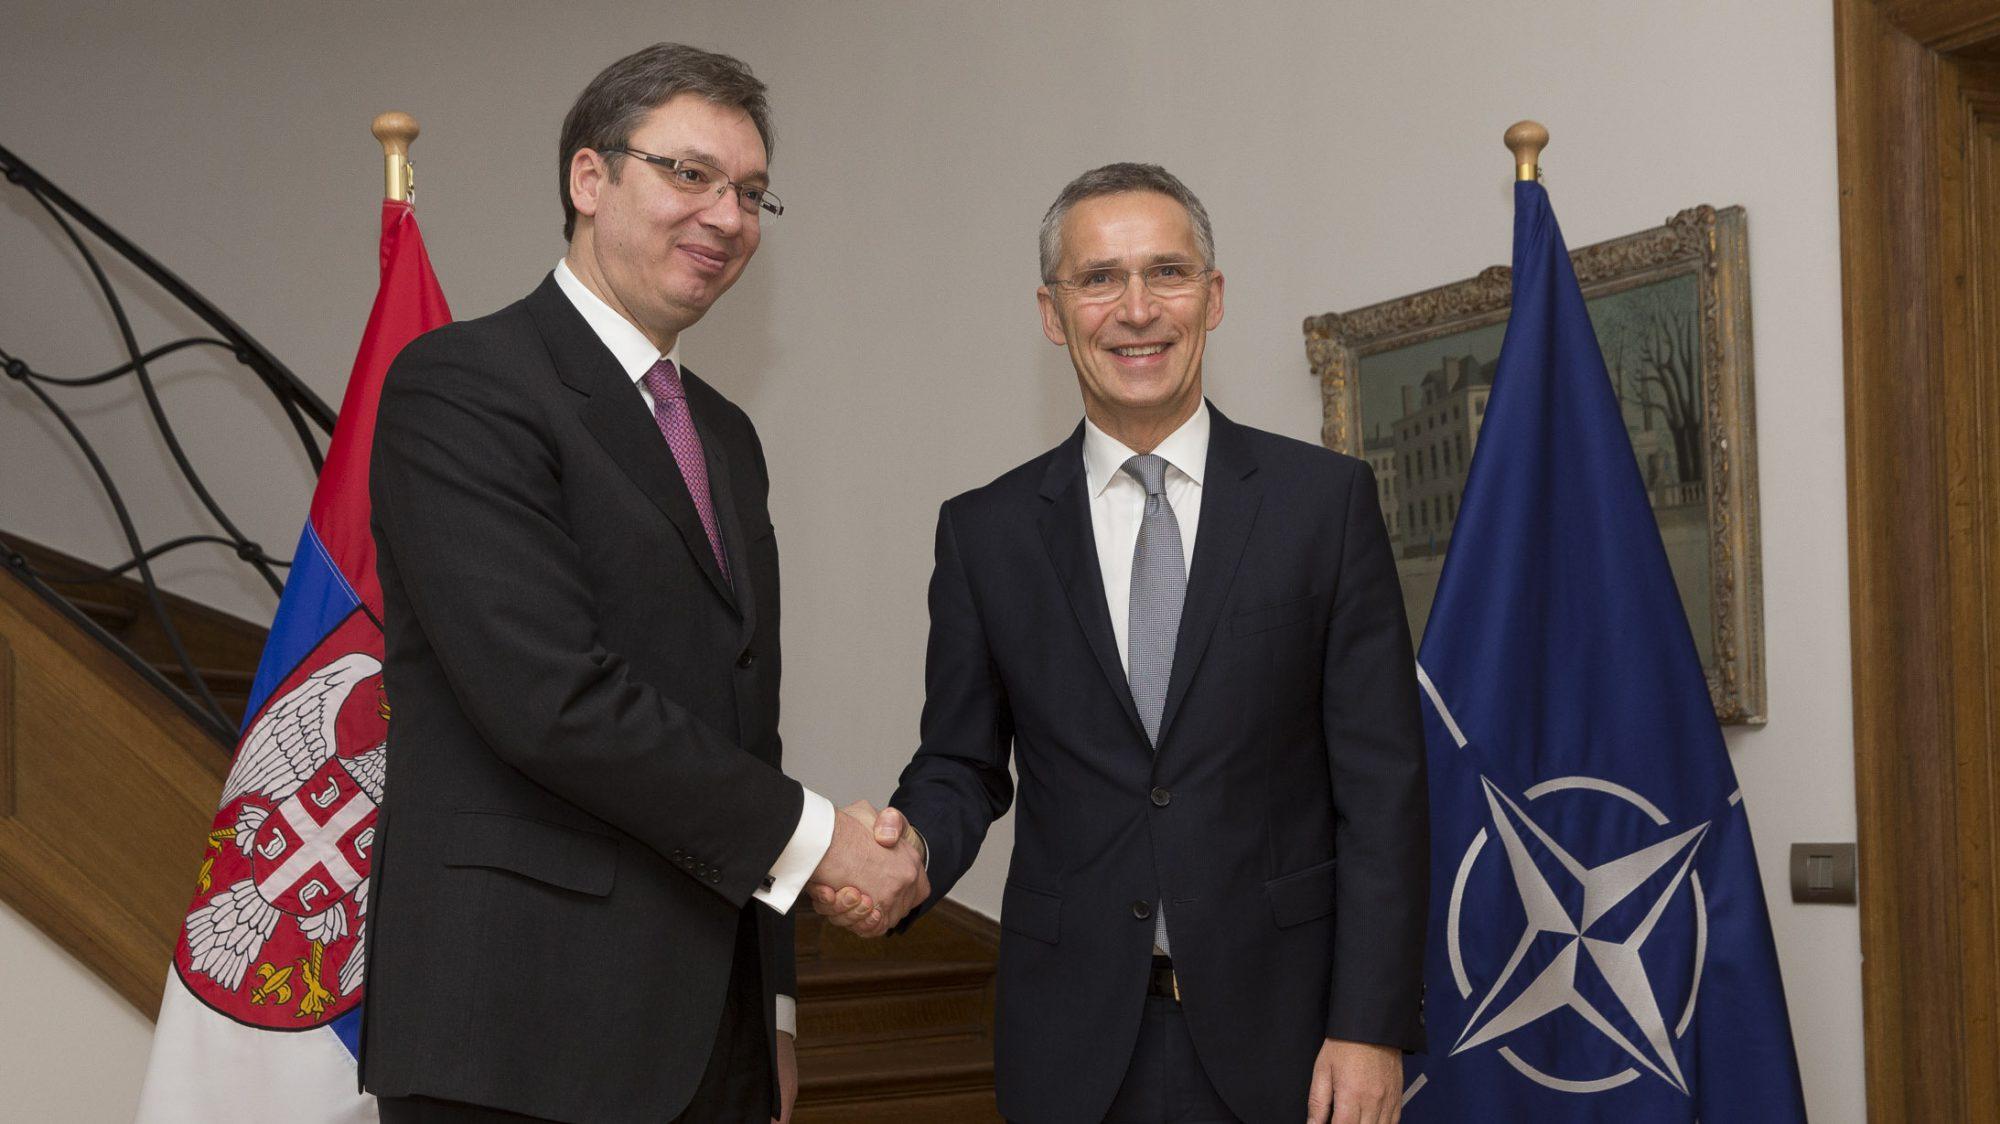 Stoltenberg visitsBelgrade to discuss NATO-Serbia co-operation